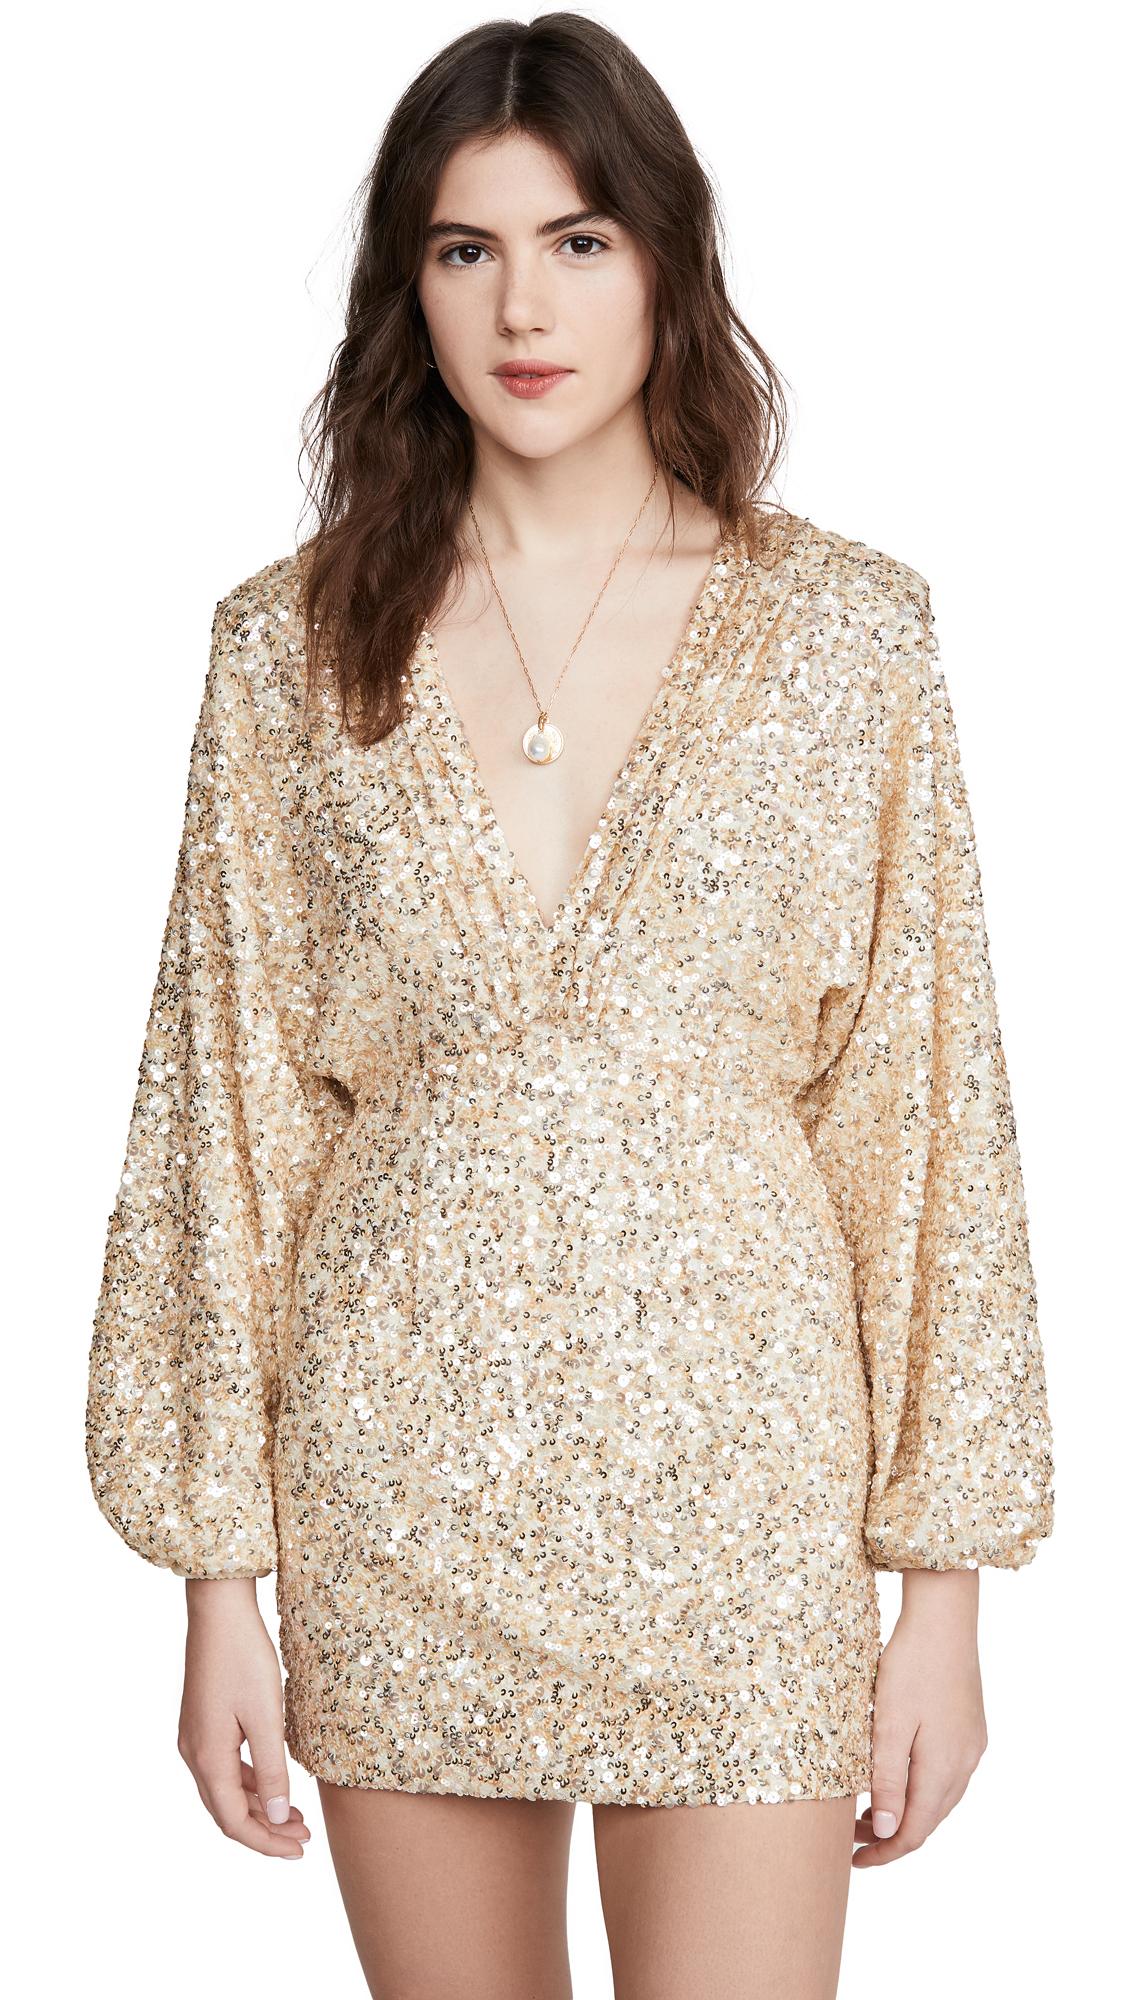 Retrofete Aubrielle Dress - 30% Off Sale